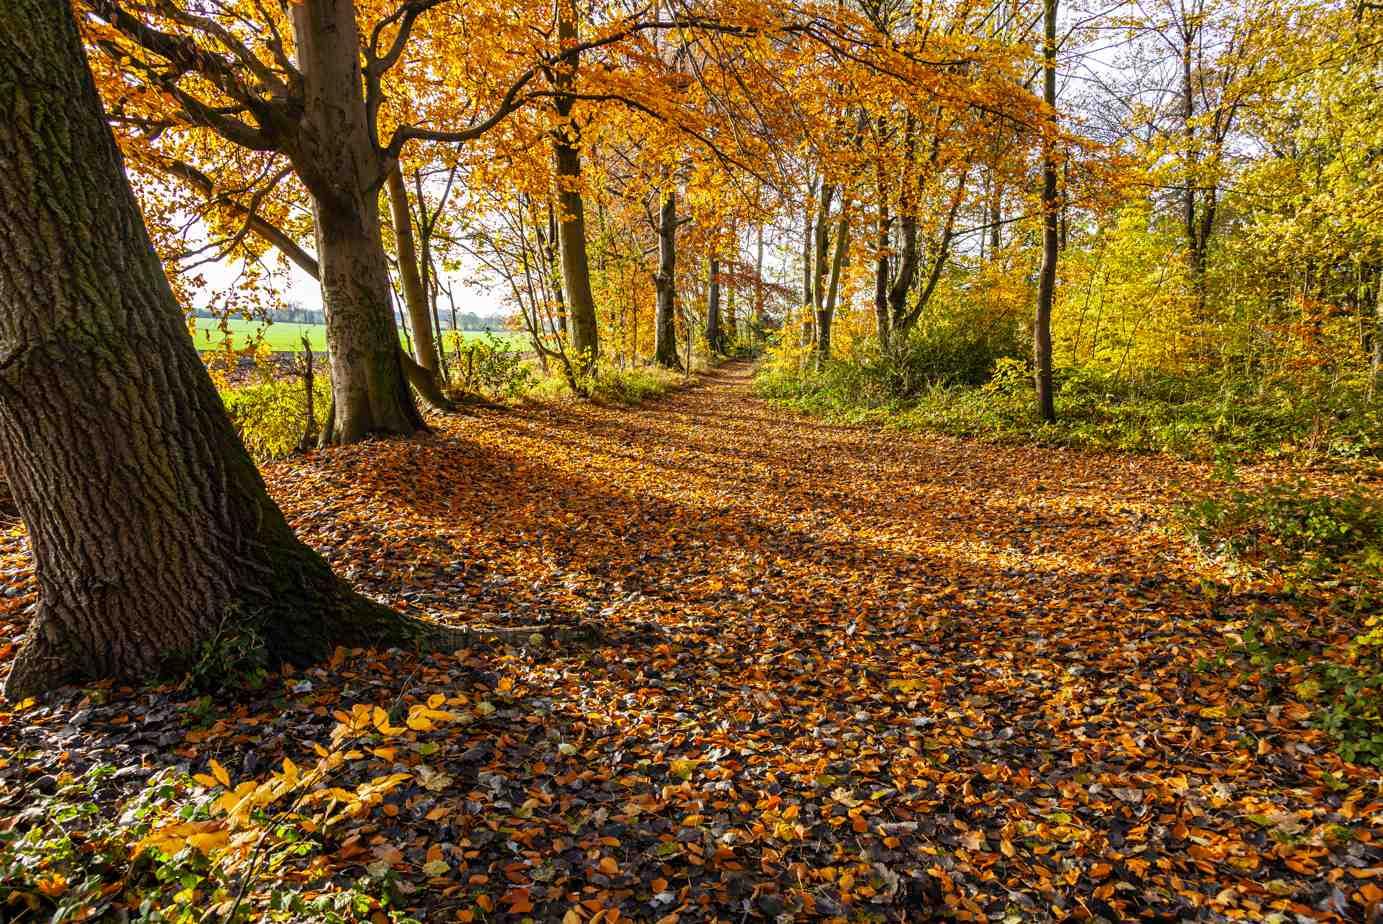 Autumn forest on a crisp sunny day